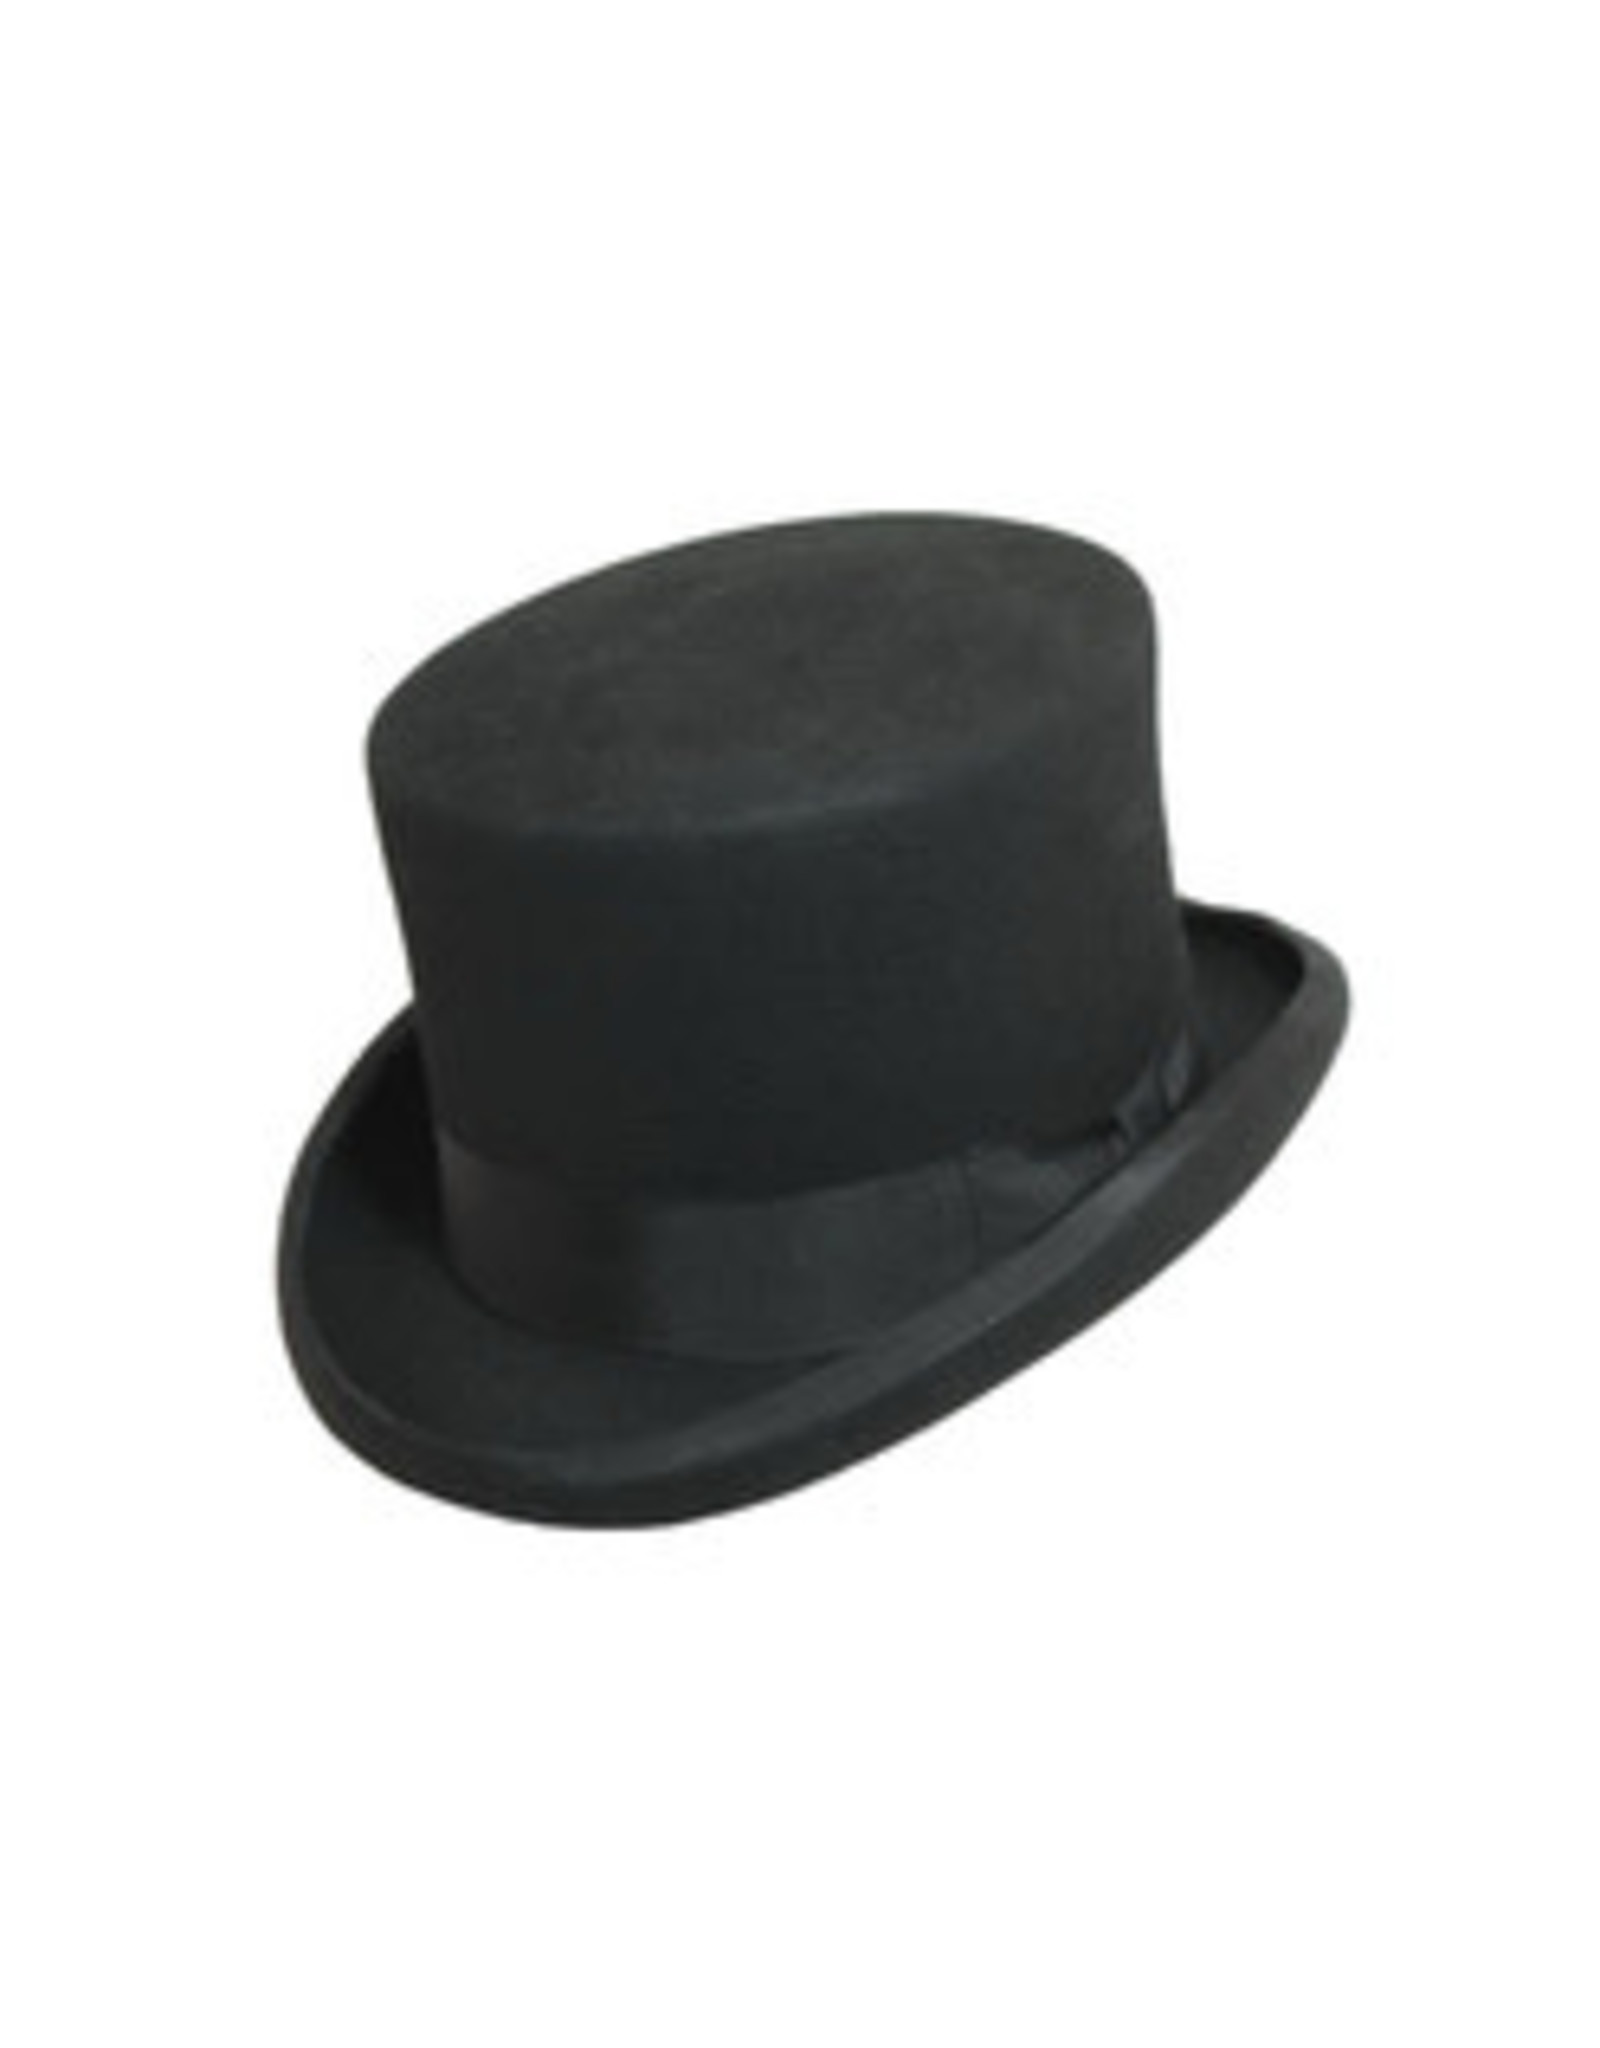 HAT-TOP HAT-DAMON